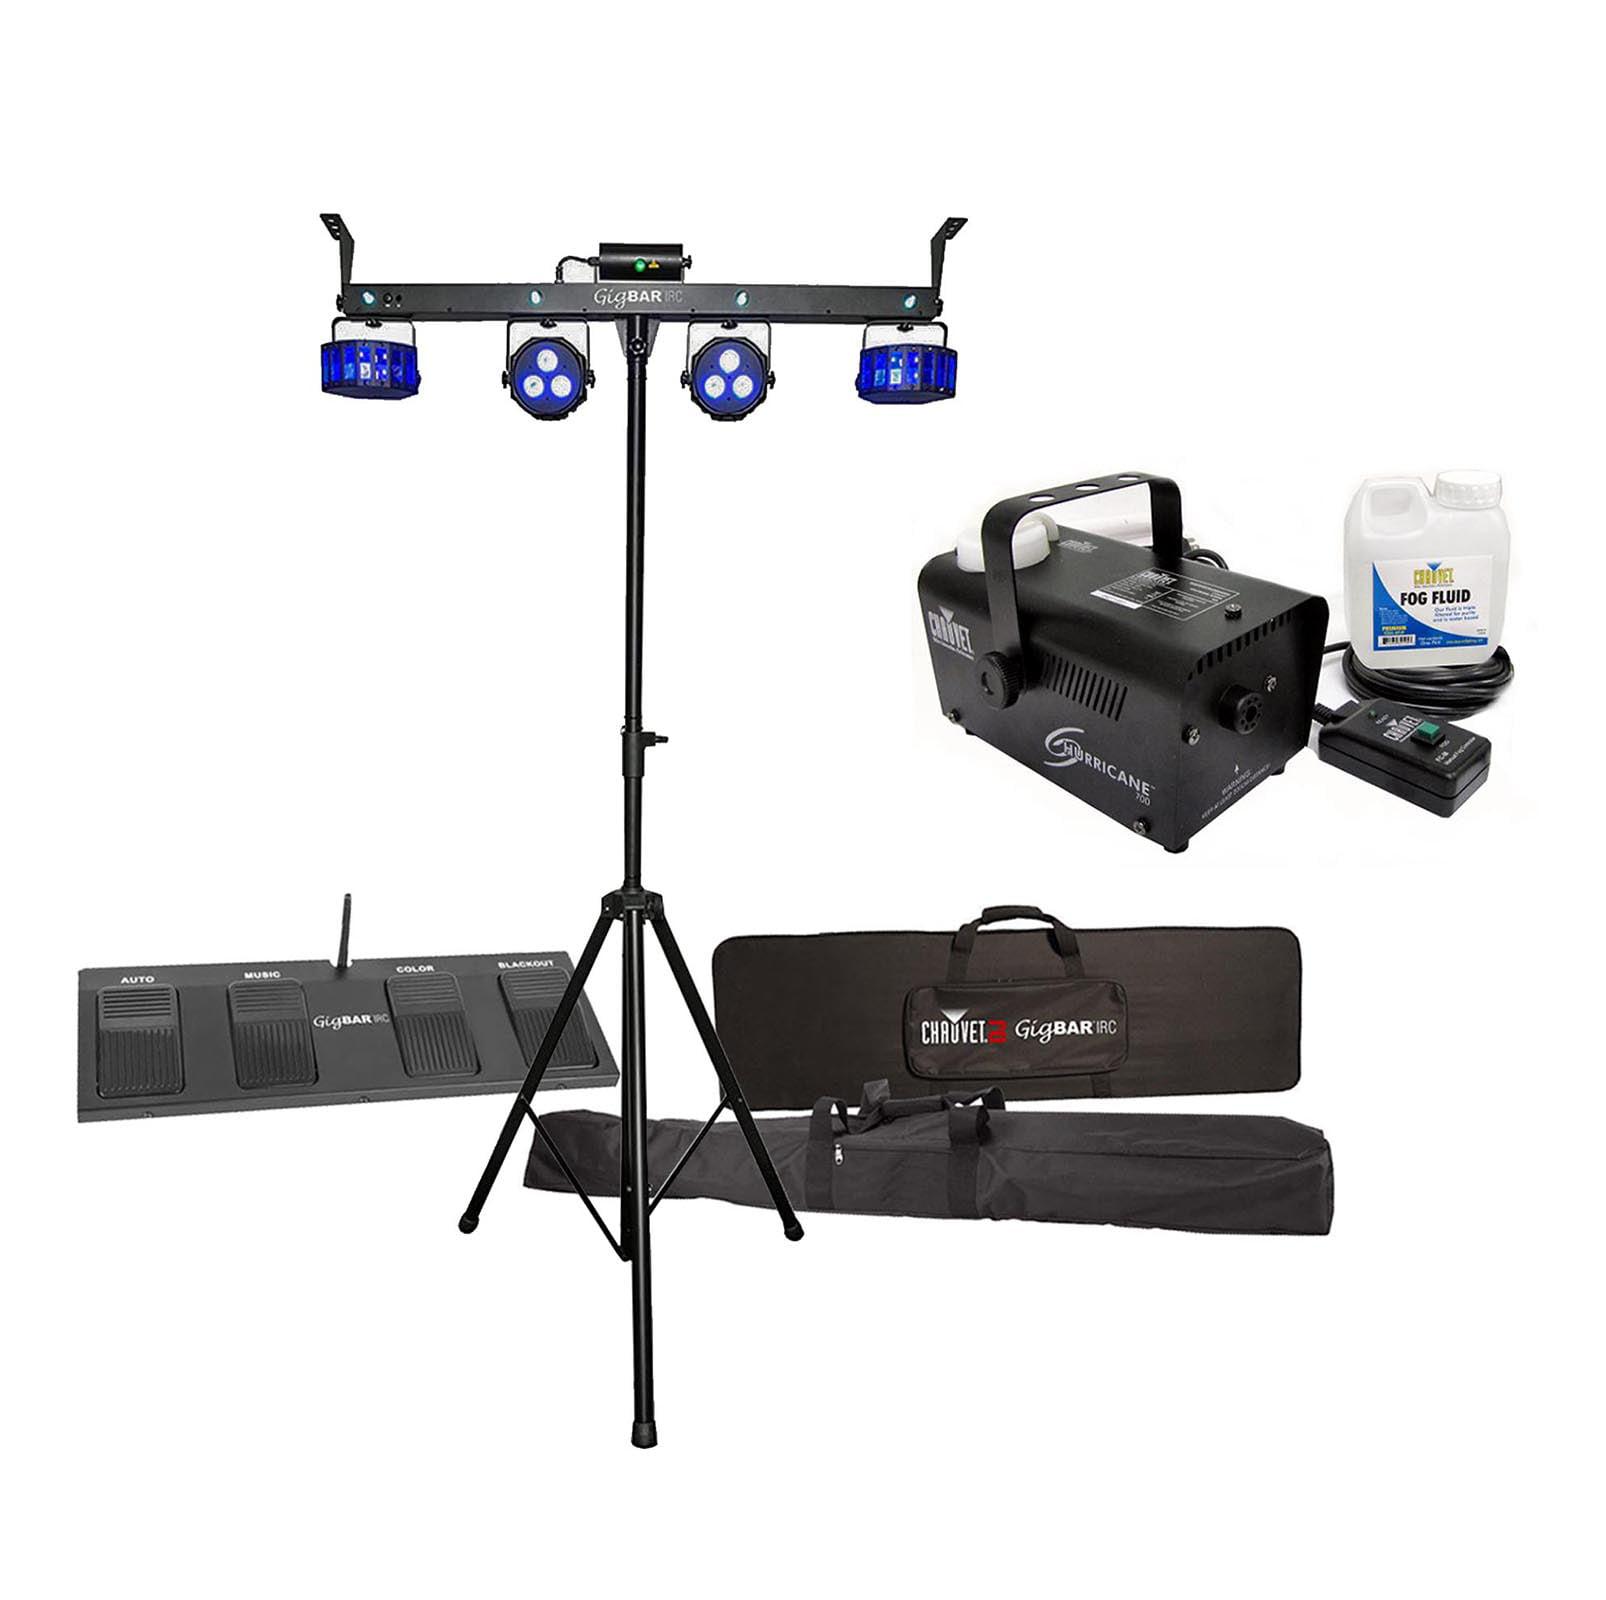 CHAUVET DJ GigBar IRC Laser Strobe Derby Par LED Light Bar System + Fog Machine by